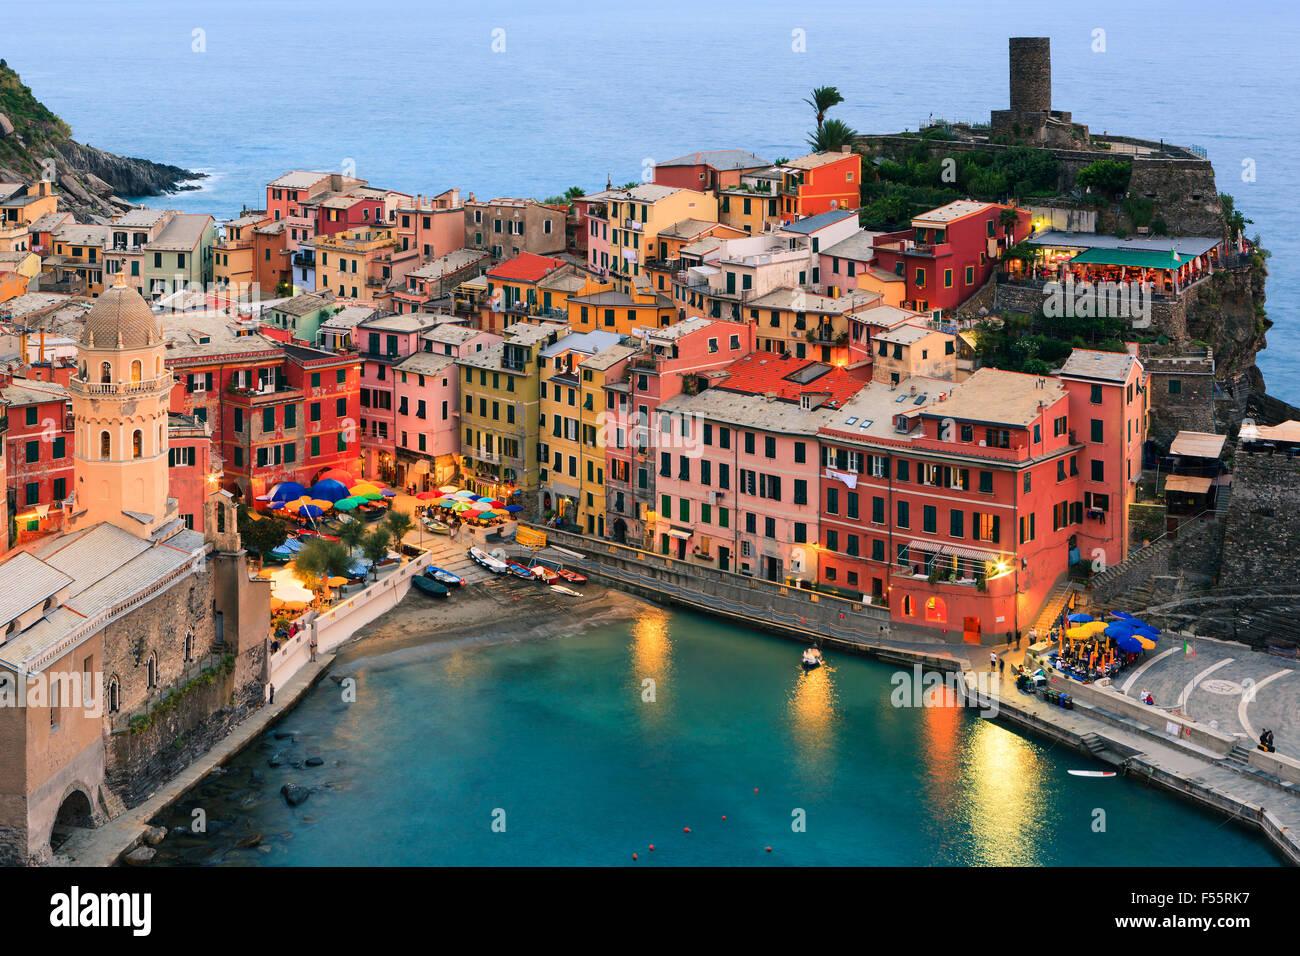 Vernazza (Latin: Vulnetia) is a town and commune located in the province of La Spezia, Liguria, northwestern Italy. - Stock Image